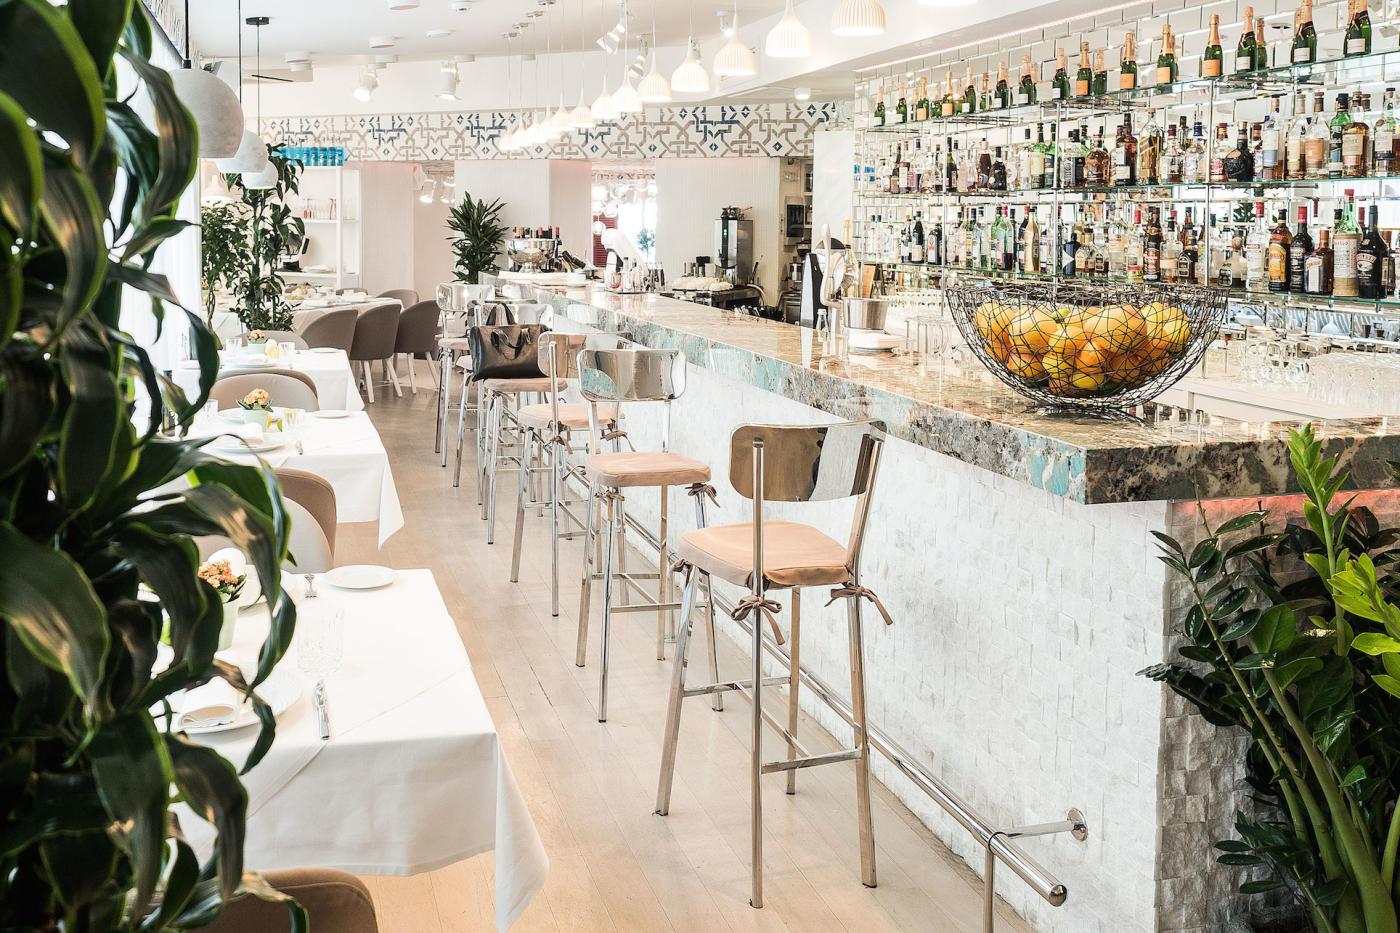 Греческий Ресторан Семирамис на Петровке (Semiramis) фото 4